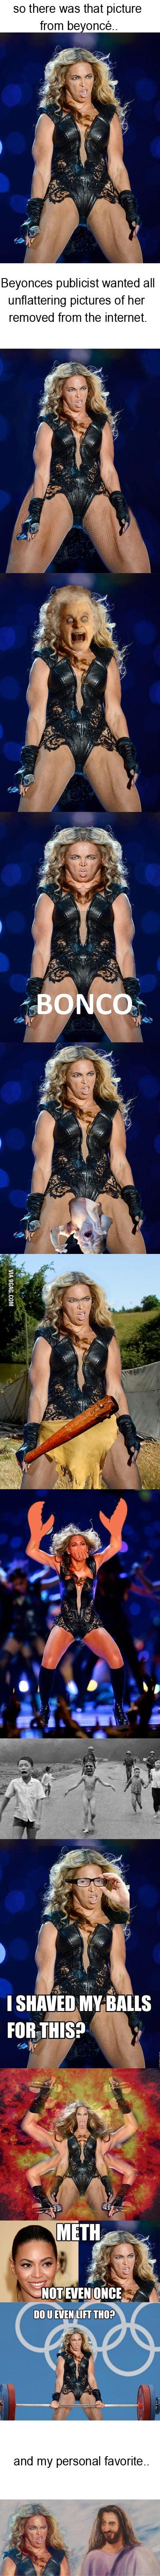 Beyonce compilation